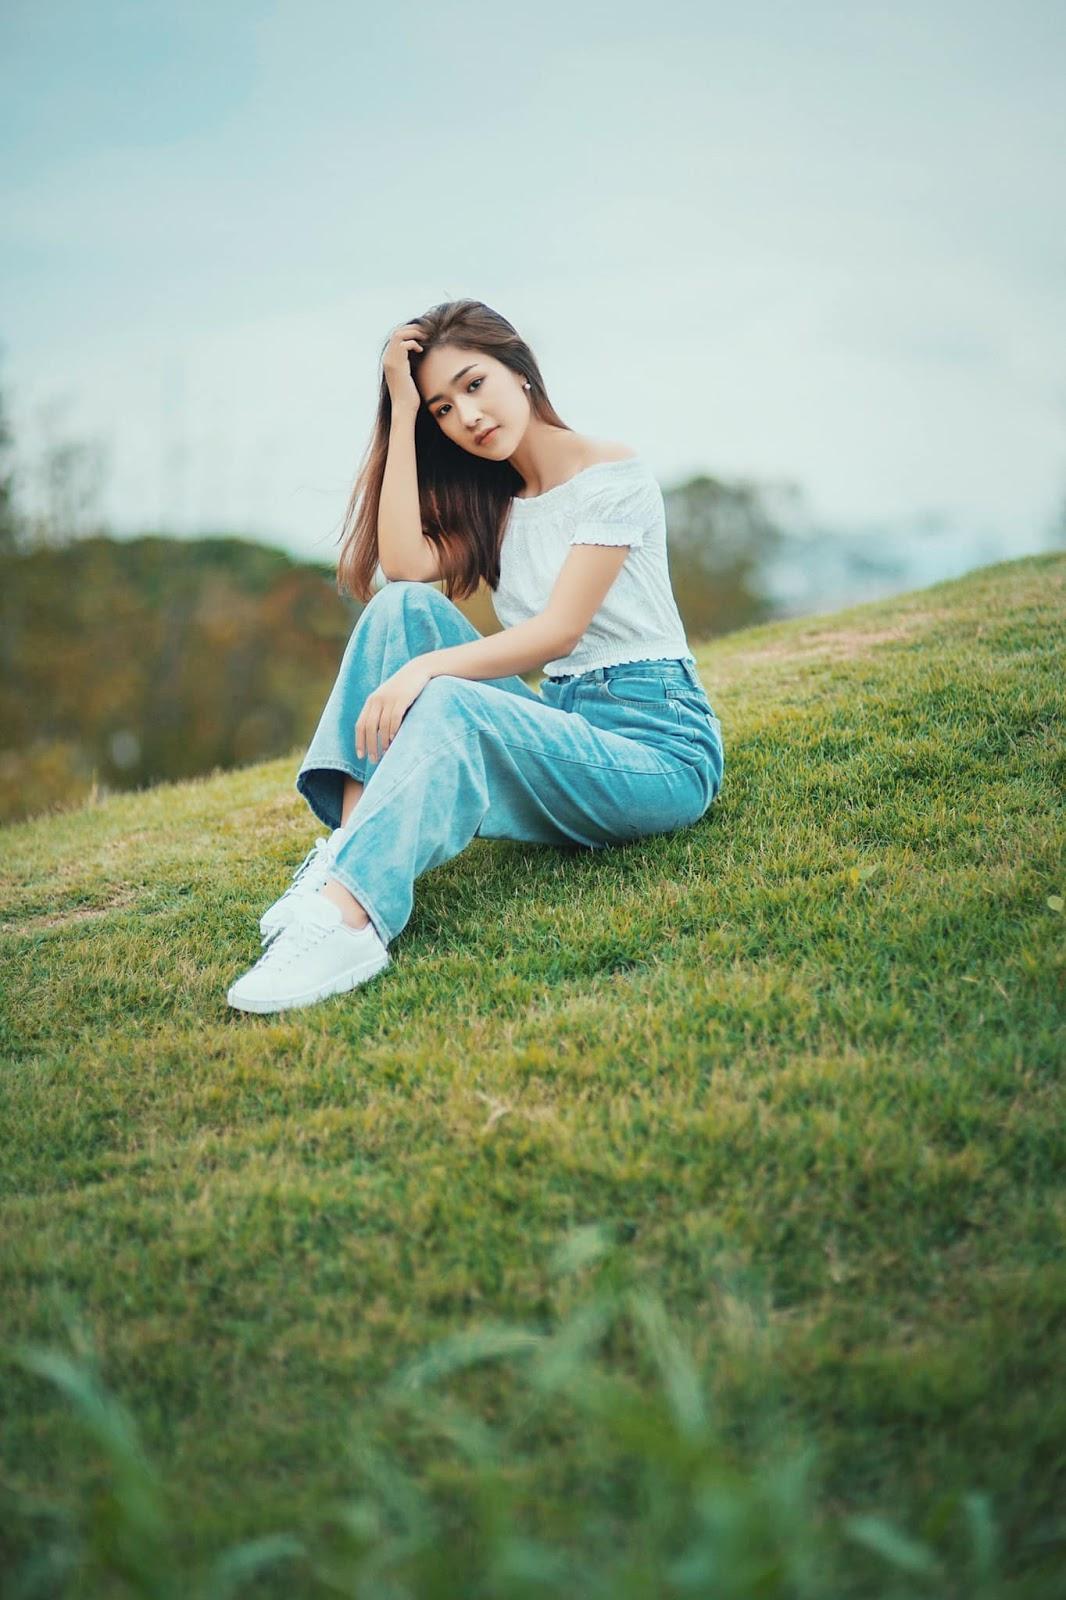 Naw Phaw Eh Htar - Beautiful Myanmar Model Girl